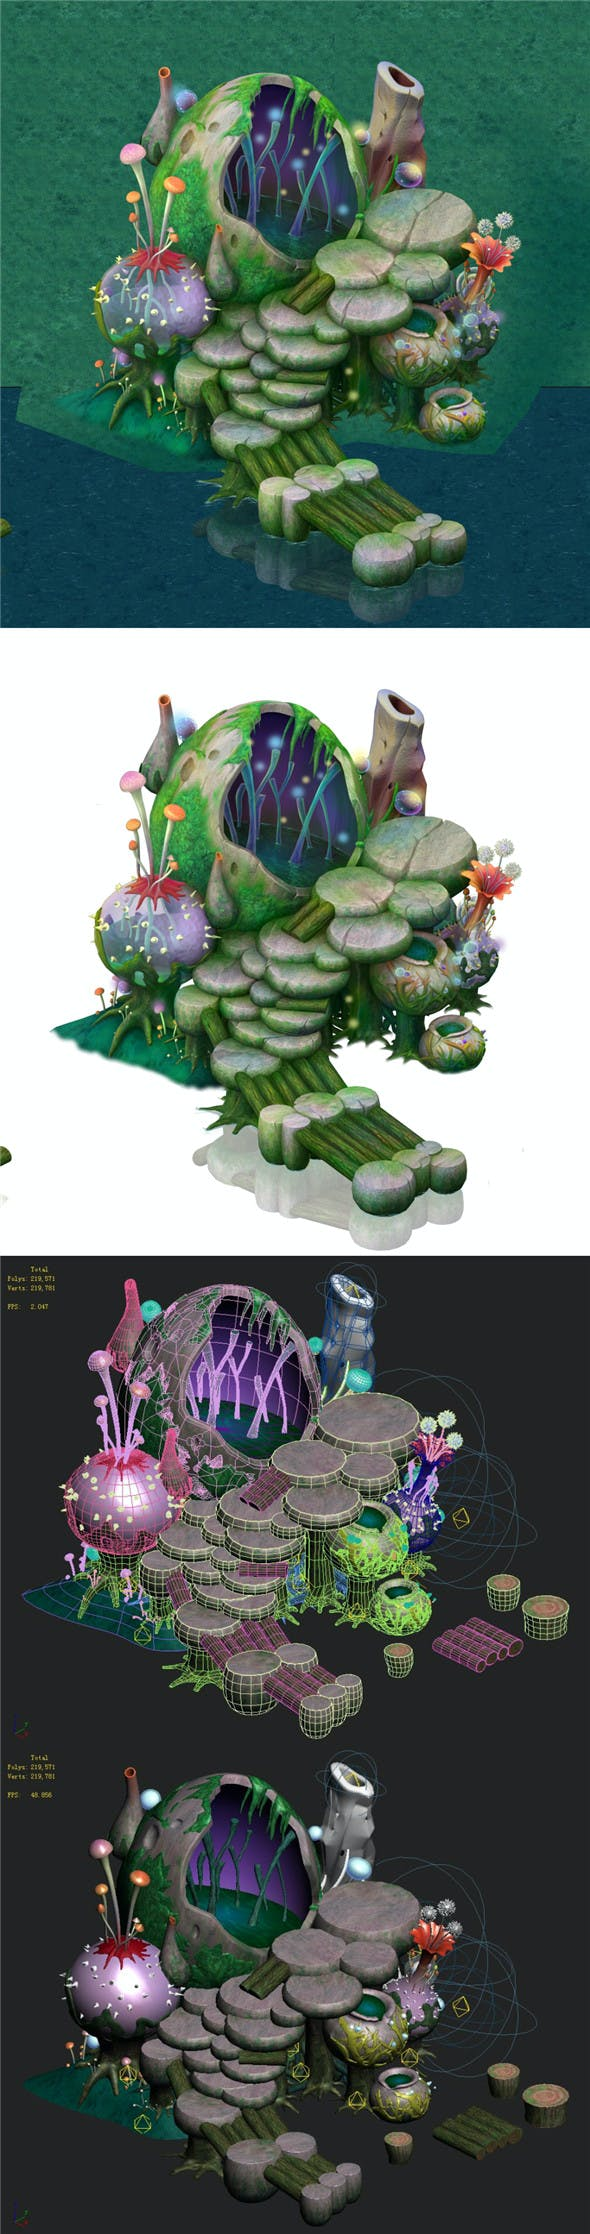 Cartoon version - spore purgatory - 3DOcean Item for Sale